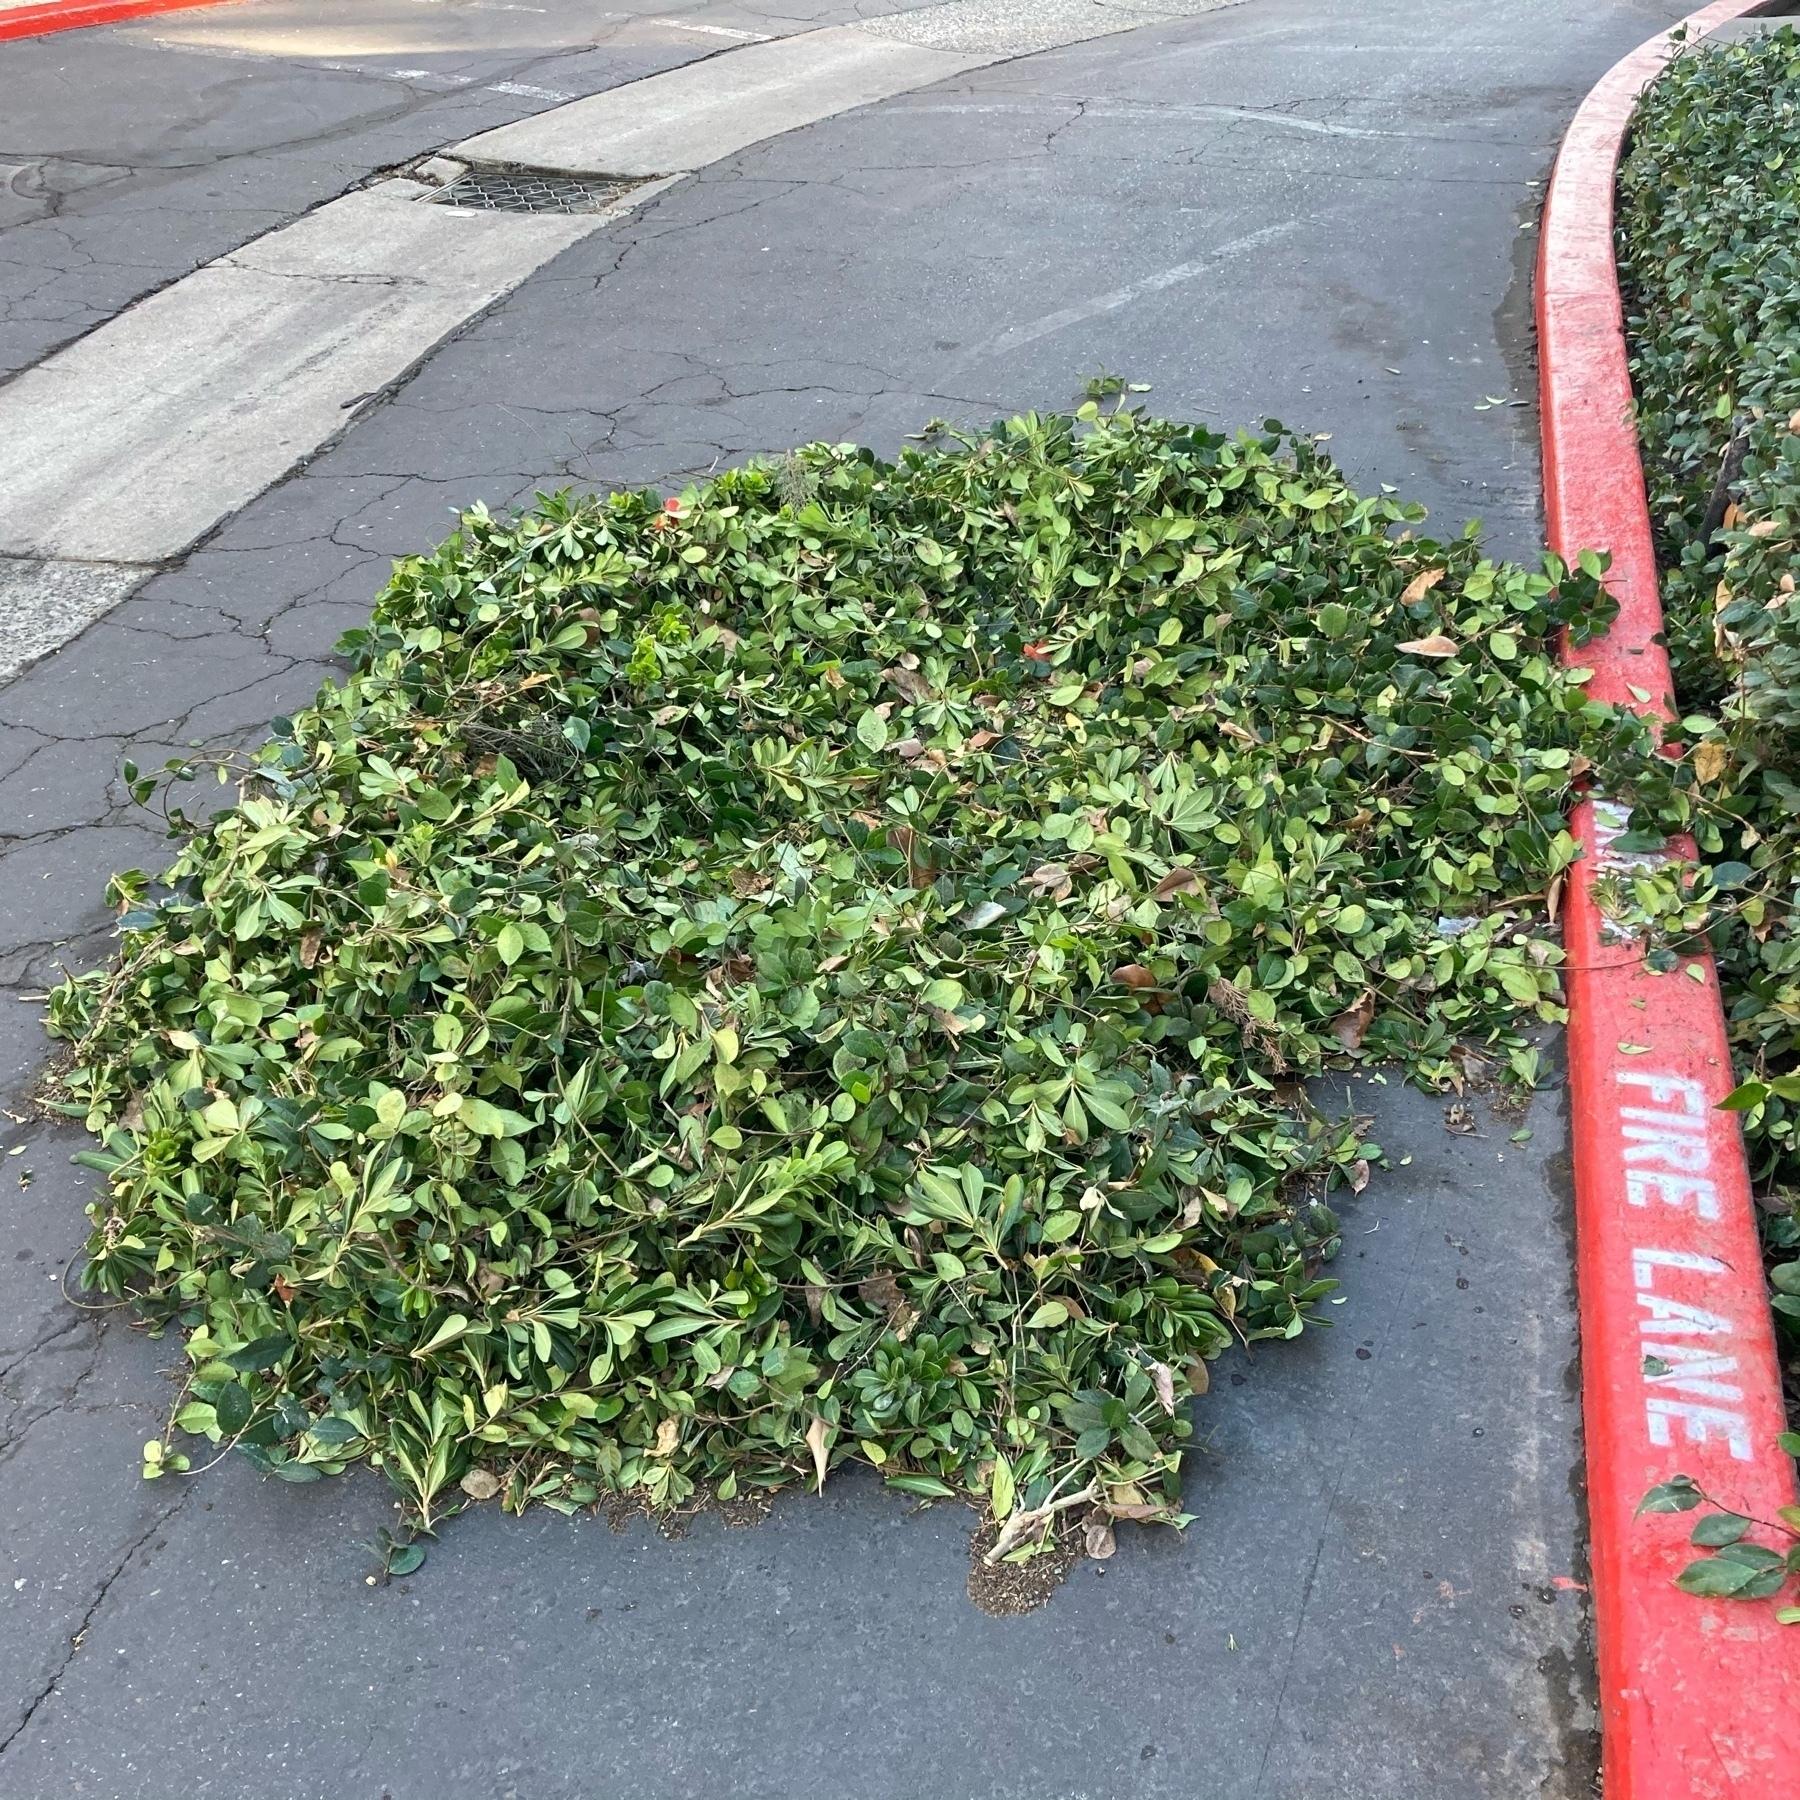 Leaf trimmings.